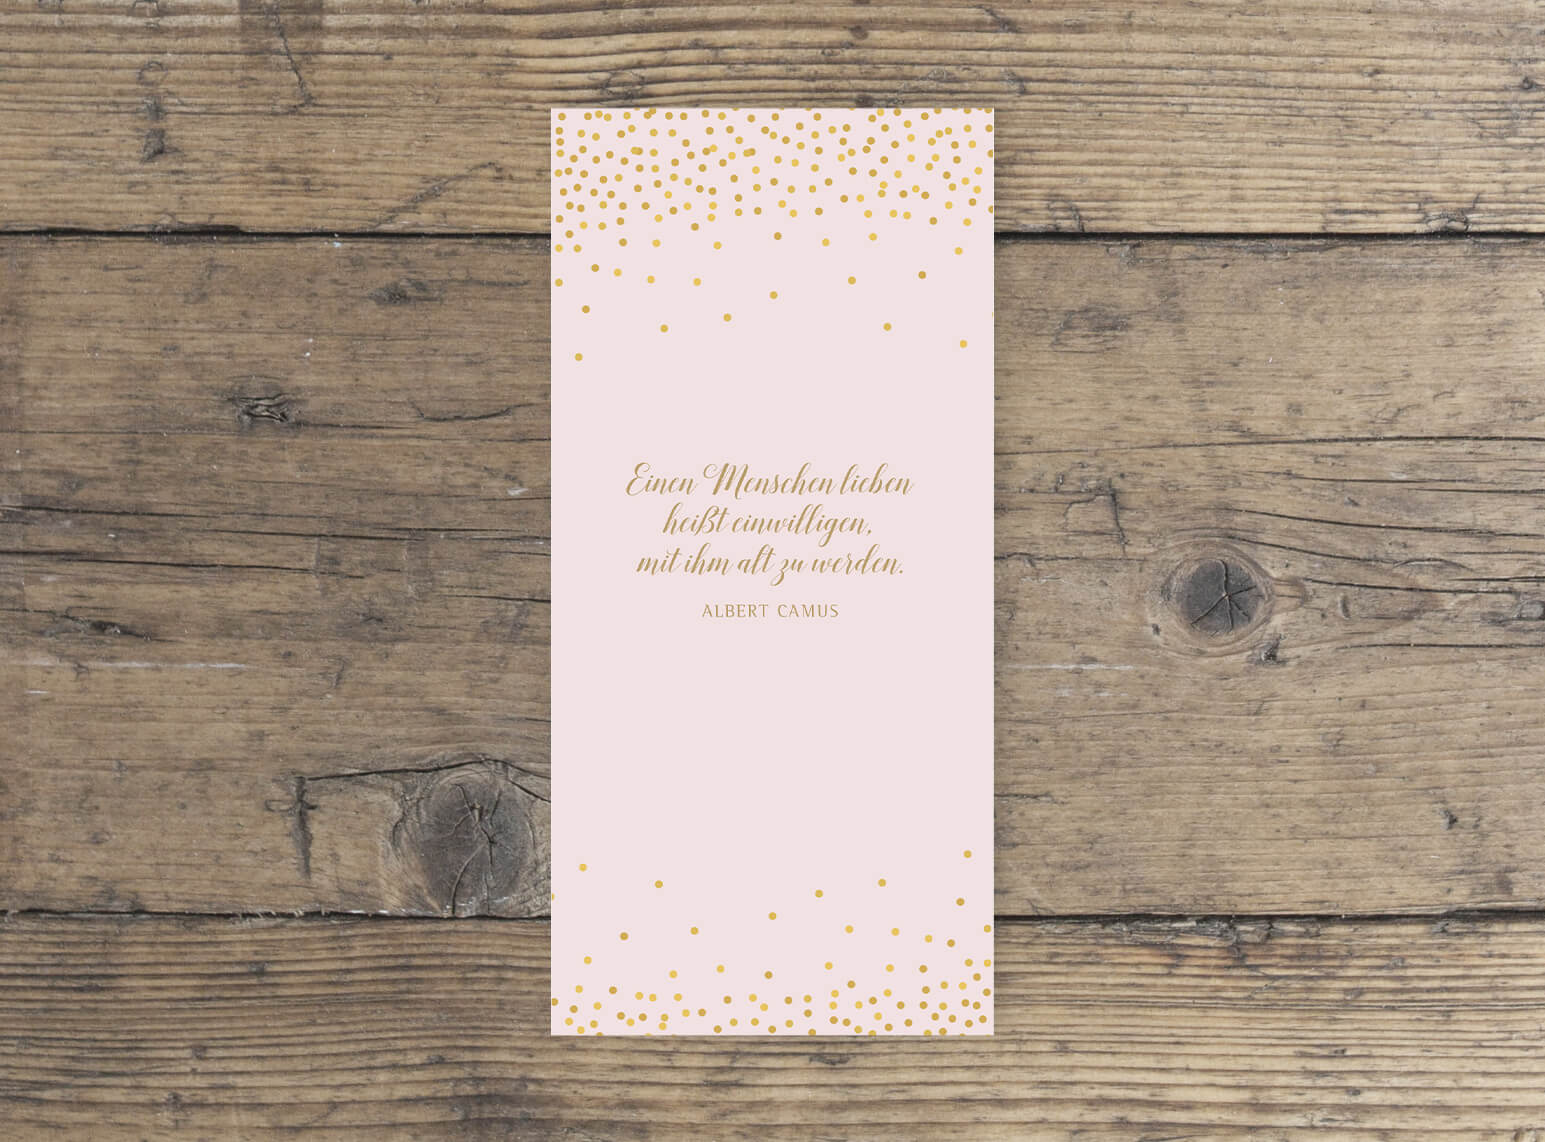 Hochzeit Kirchenblatt DINlang hochformat in Rosa Gold geschwungene Schrift rückseite